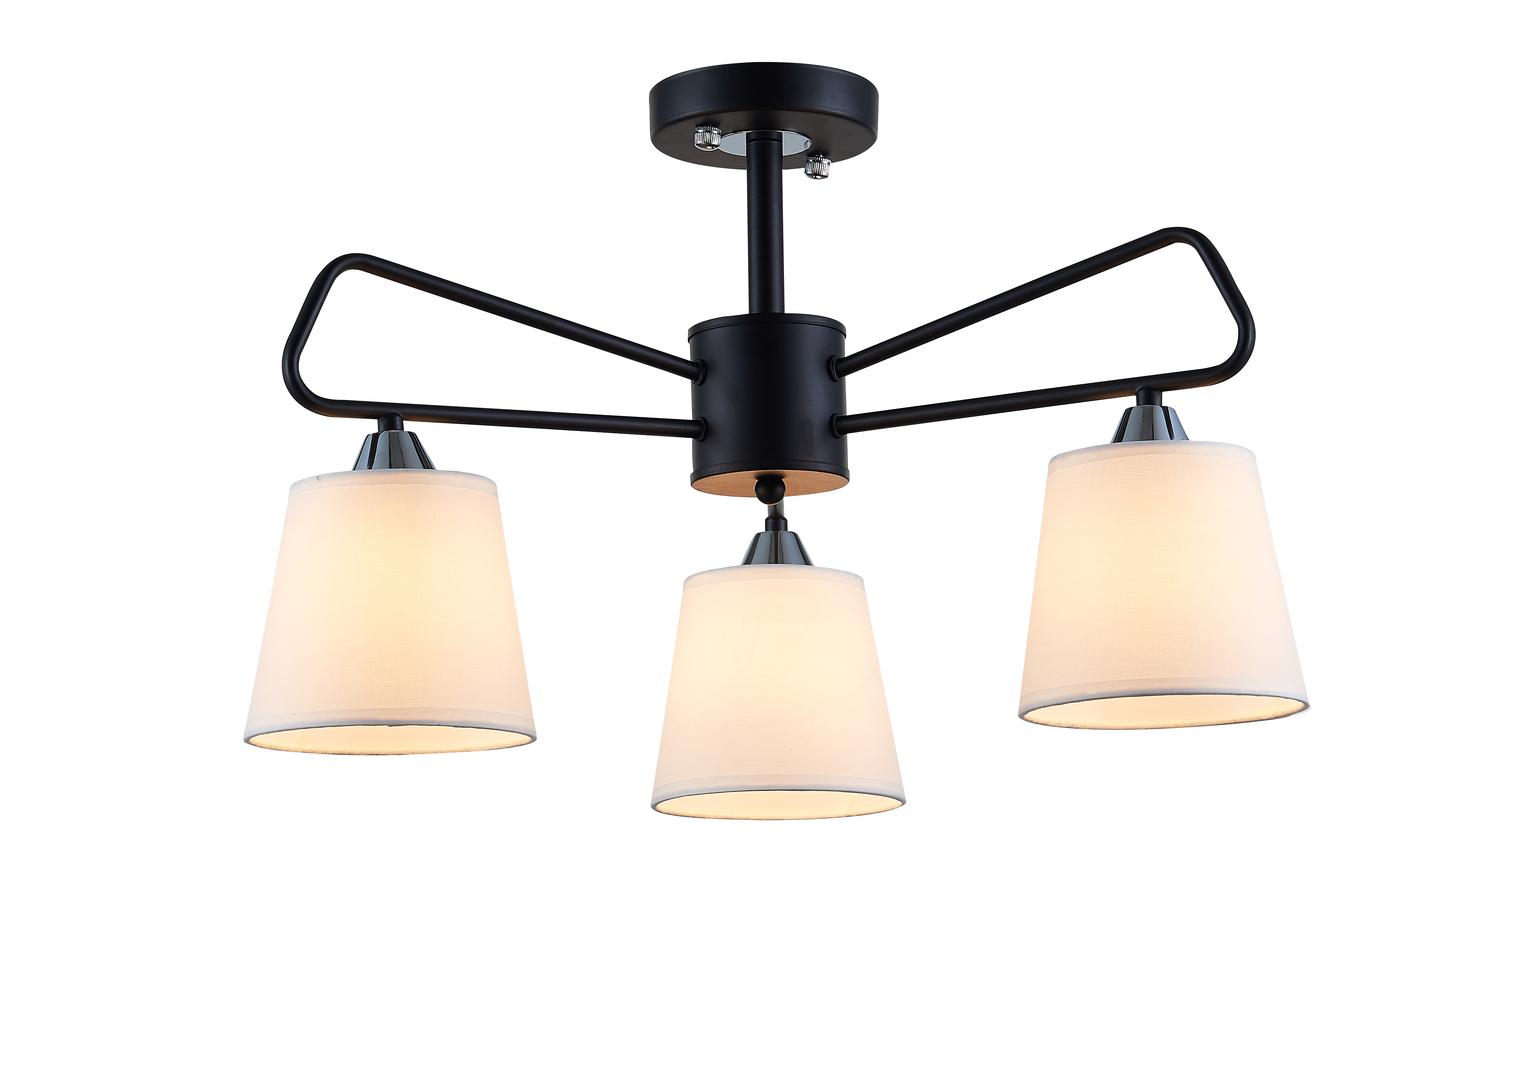 Lampa Wisząca Morley 3 Czarny